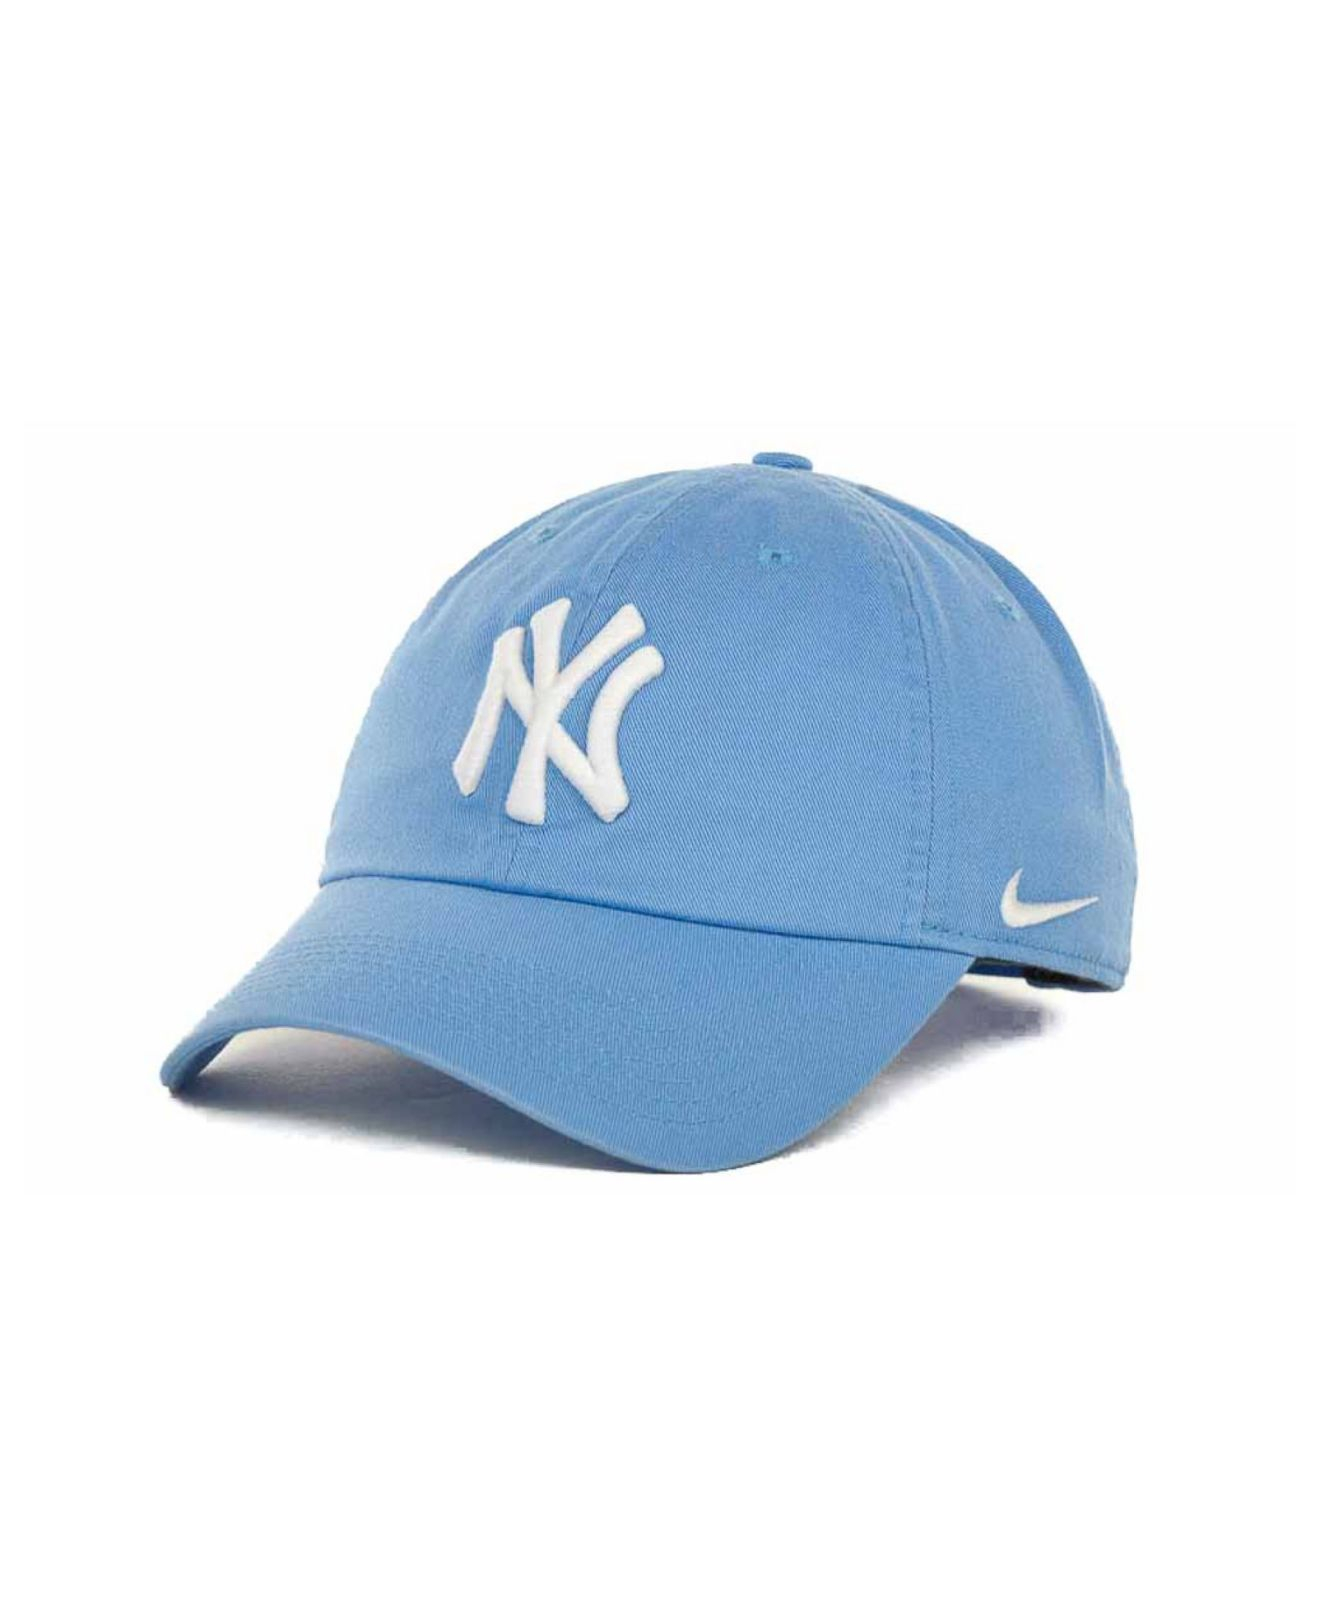 ef5032155dfac ... lyst nike womens new york yankees stadium cap in blue